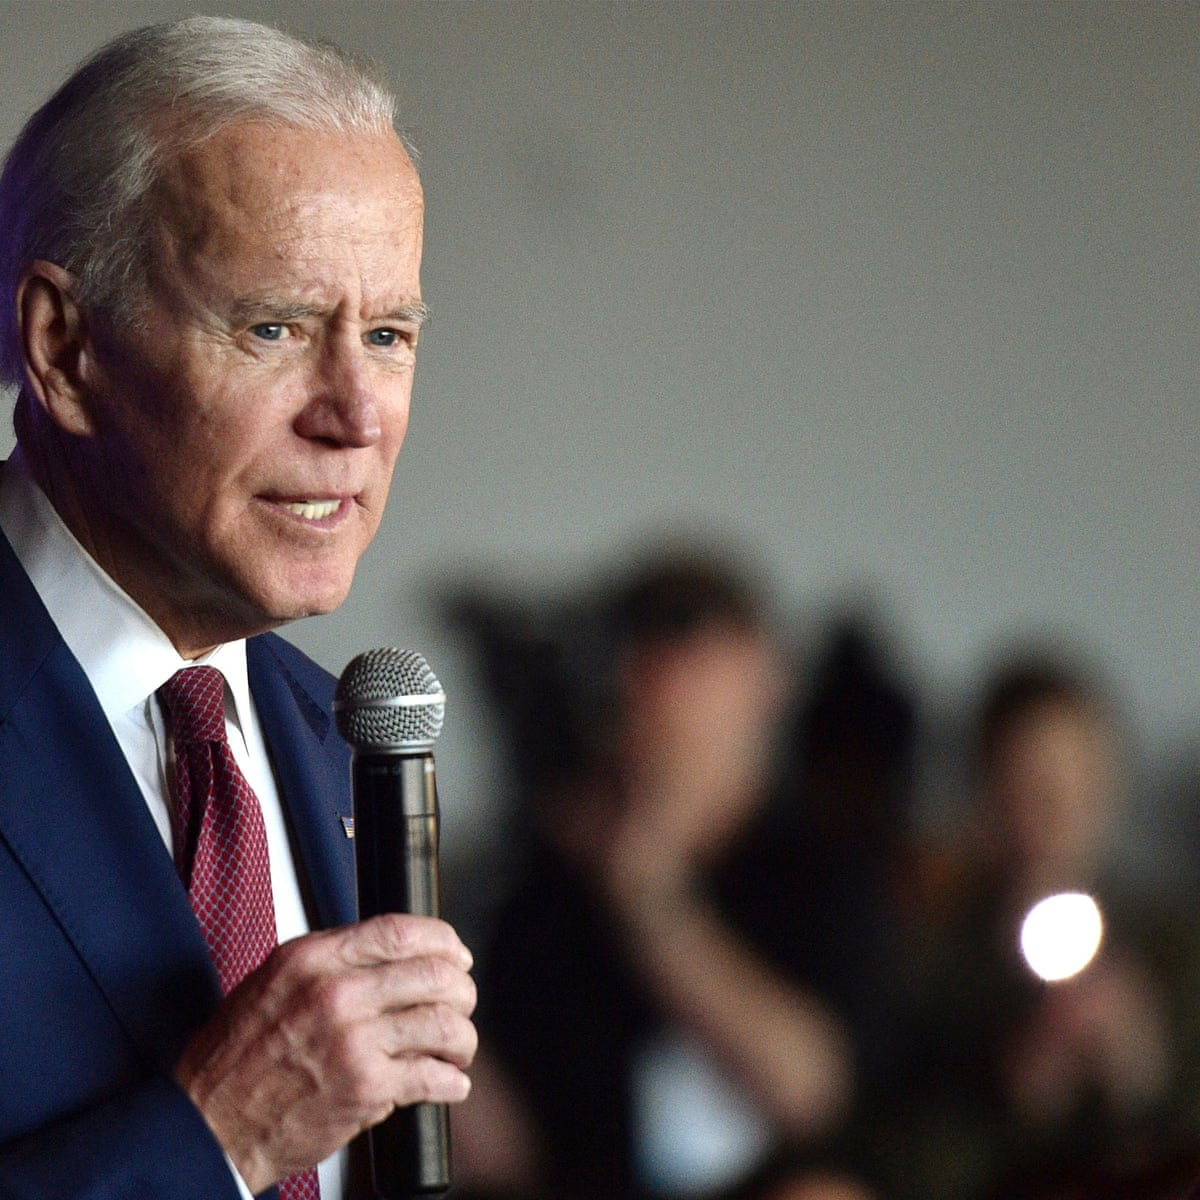 Joe Biden Championed The Iraq War Will That Come Back To Haunt Him Now Joe Biden The Guardian